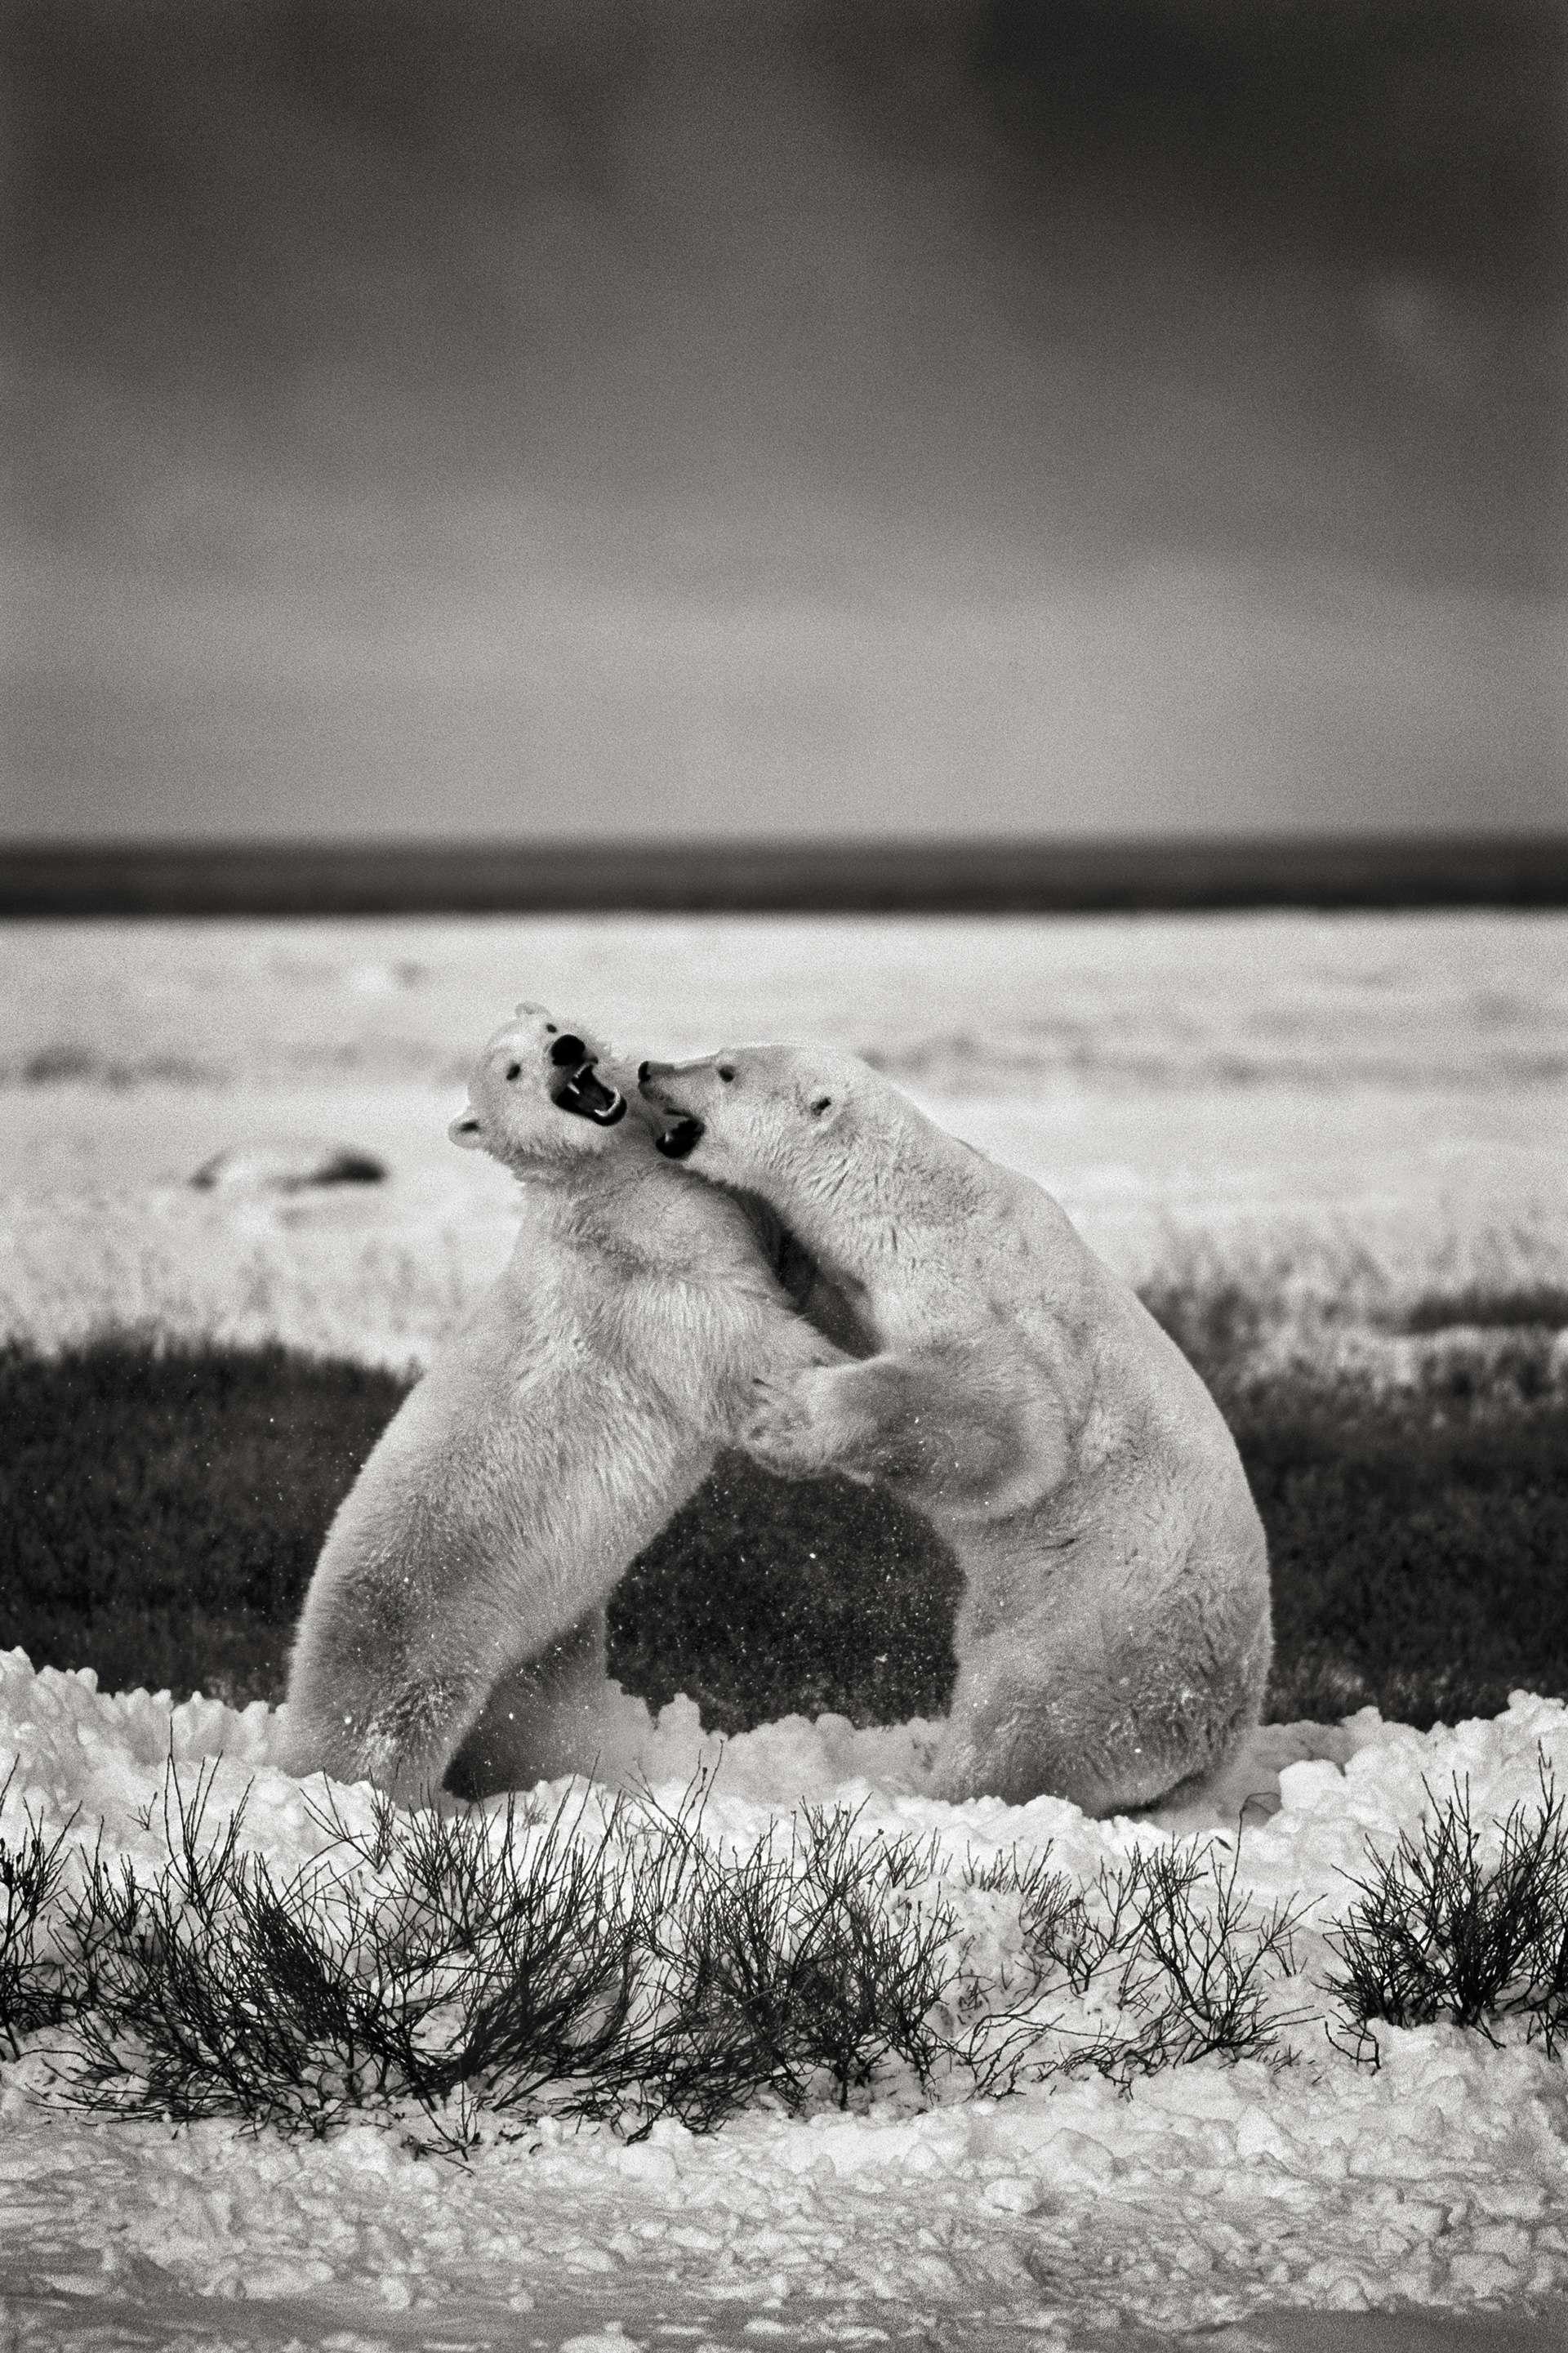 Gilles Martin's photograph : polar bear from Canada, Struggle for life